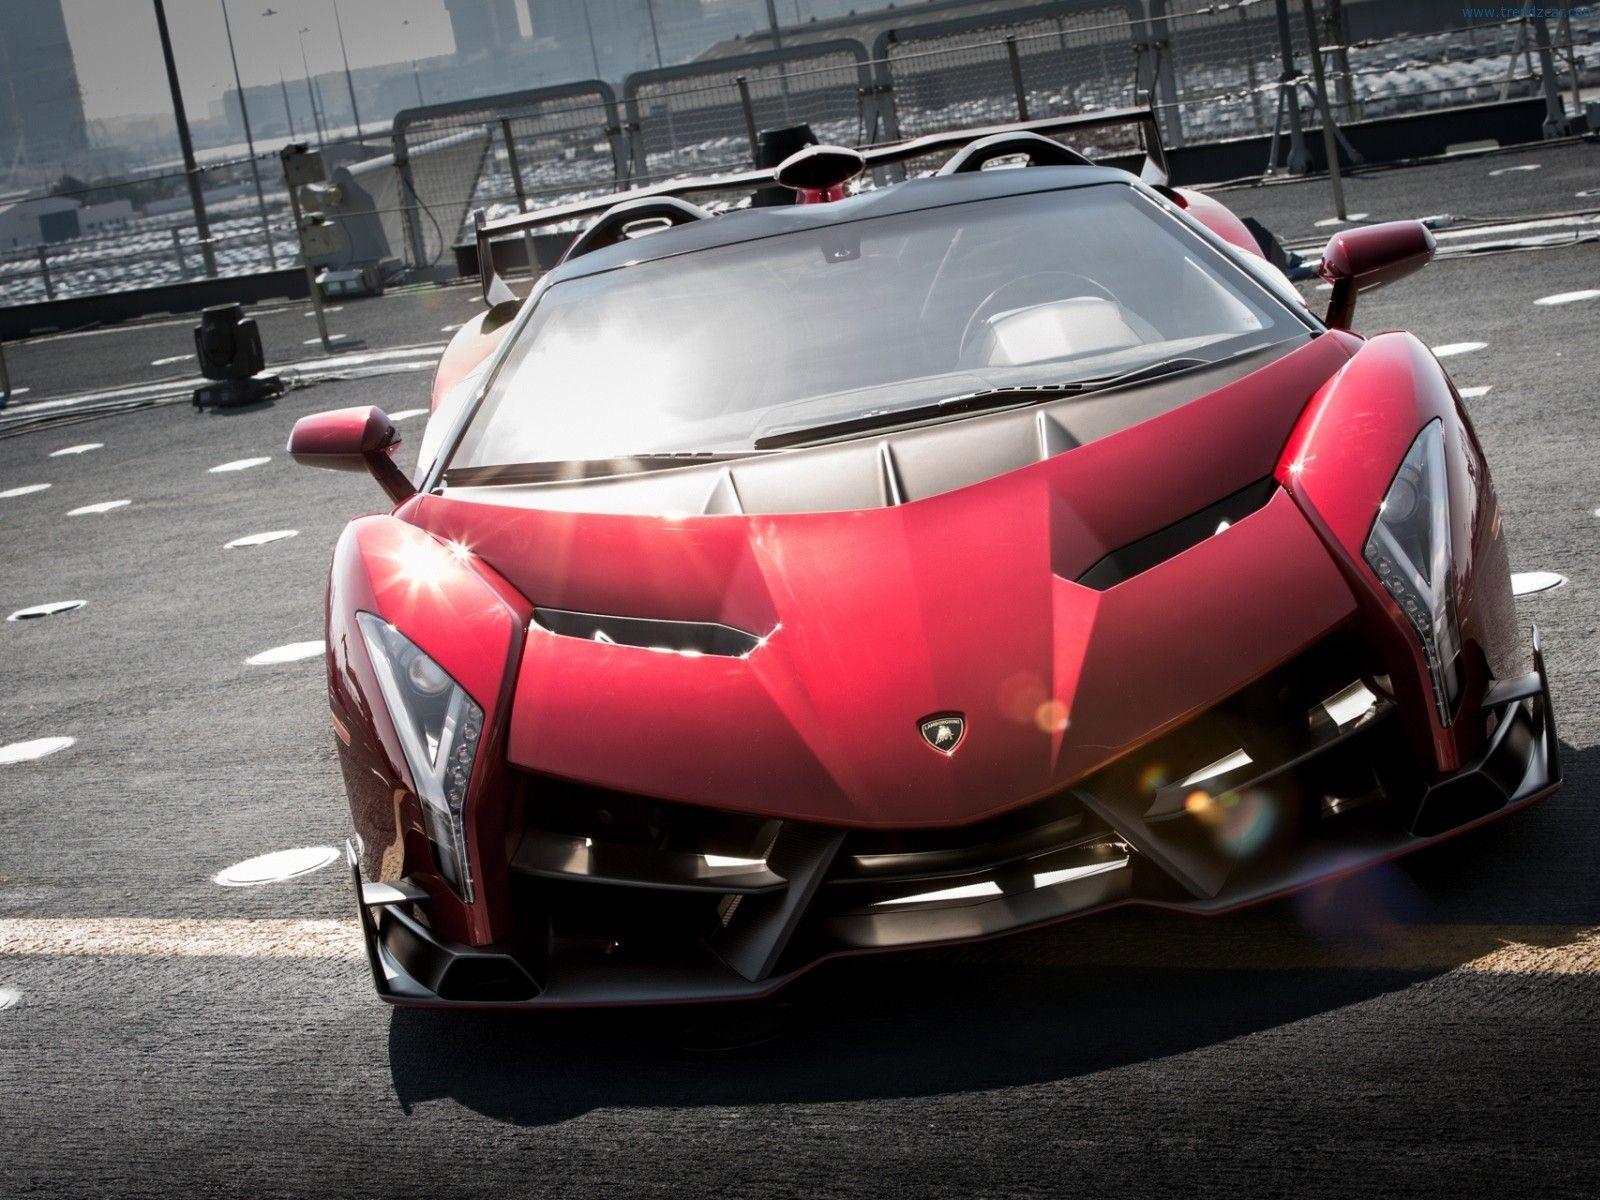 Incroyable Lamborghini Veneno Roadster Hd Wallpaper